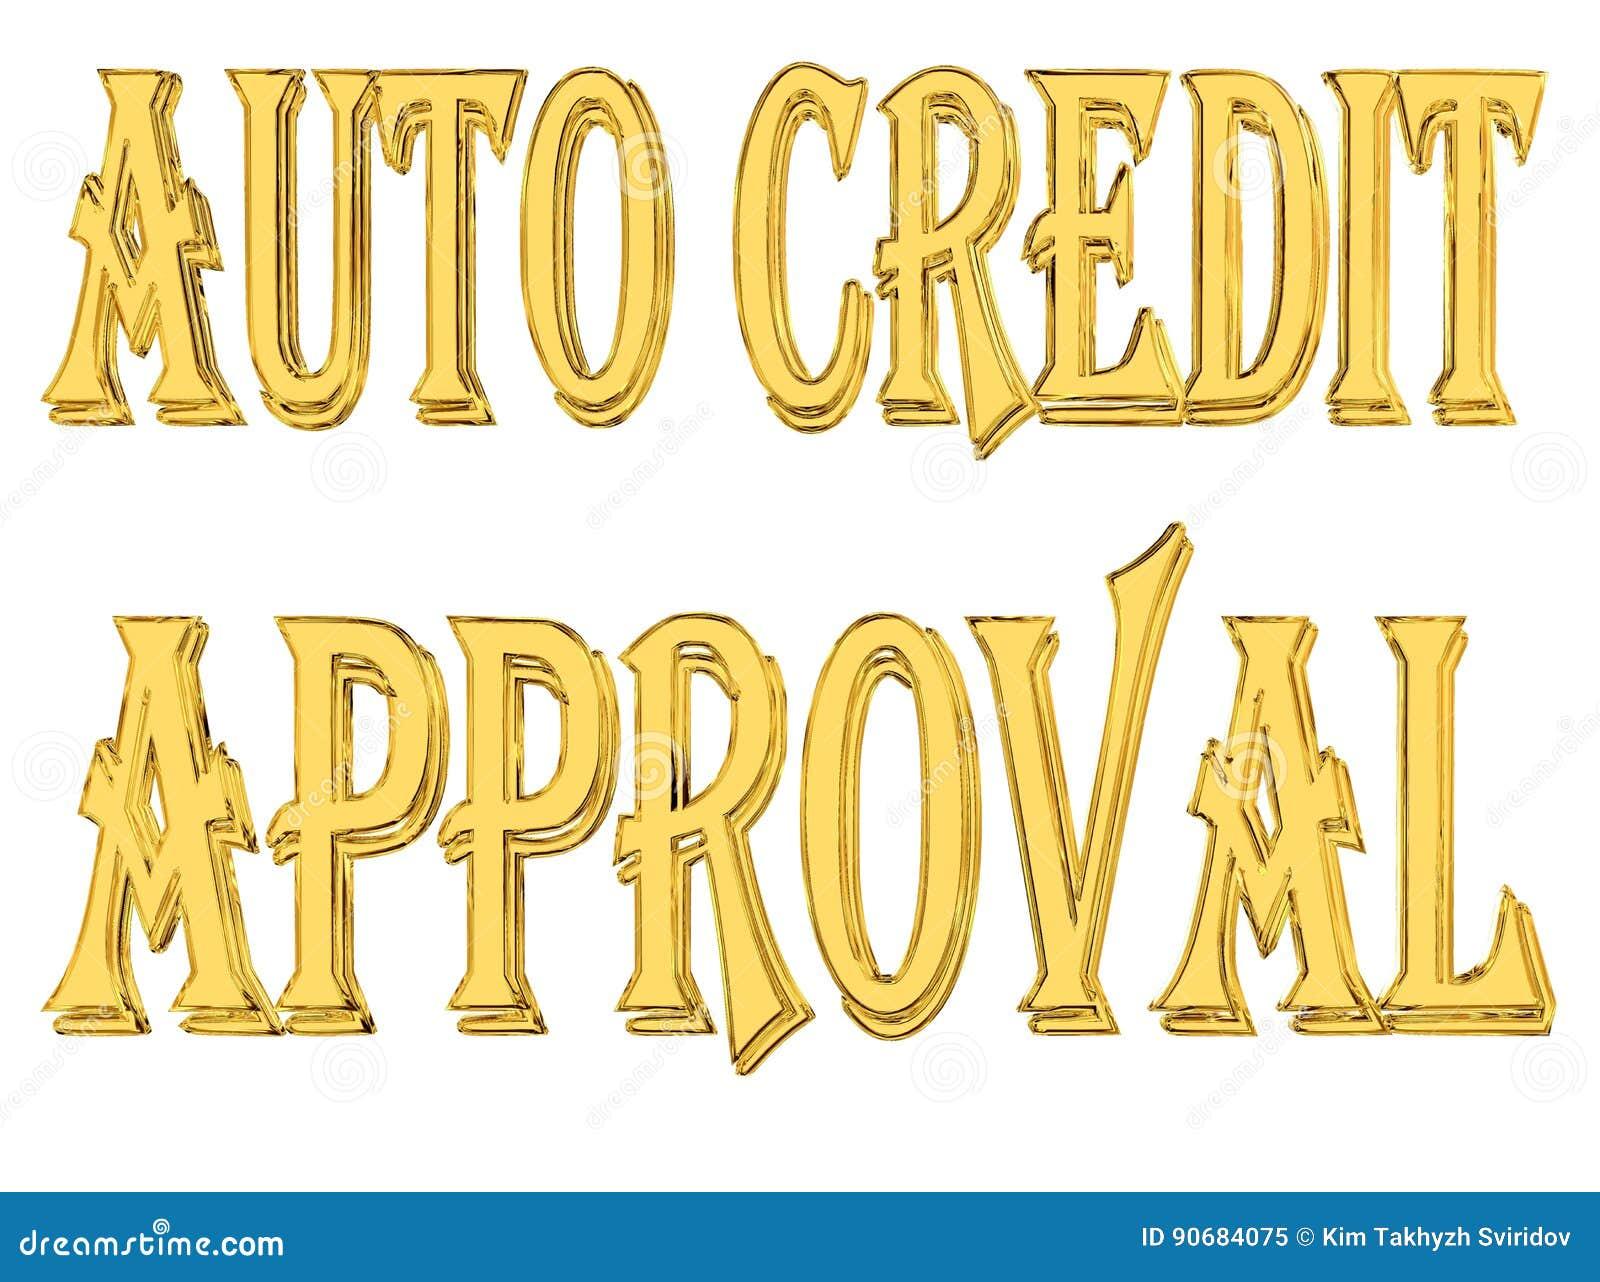 Кредит текста золота автоматический одобрил на белой предпосылке